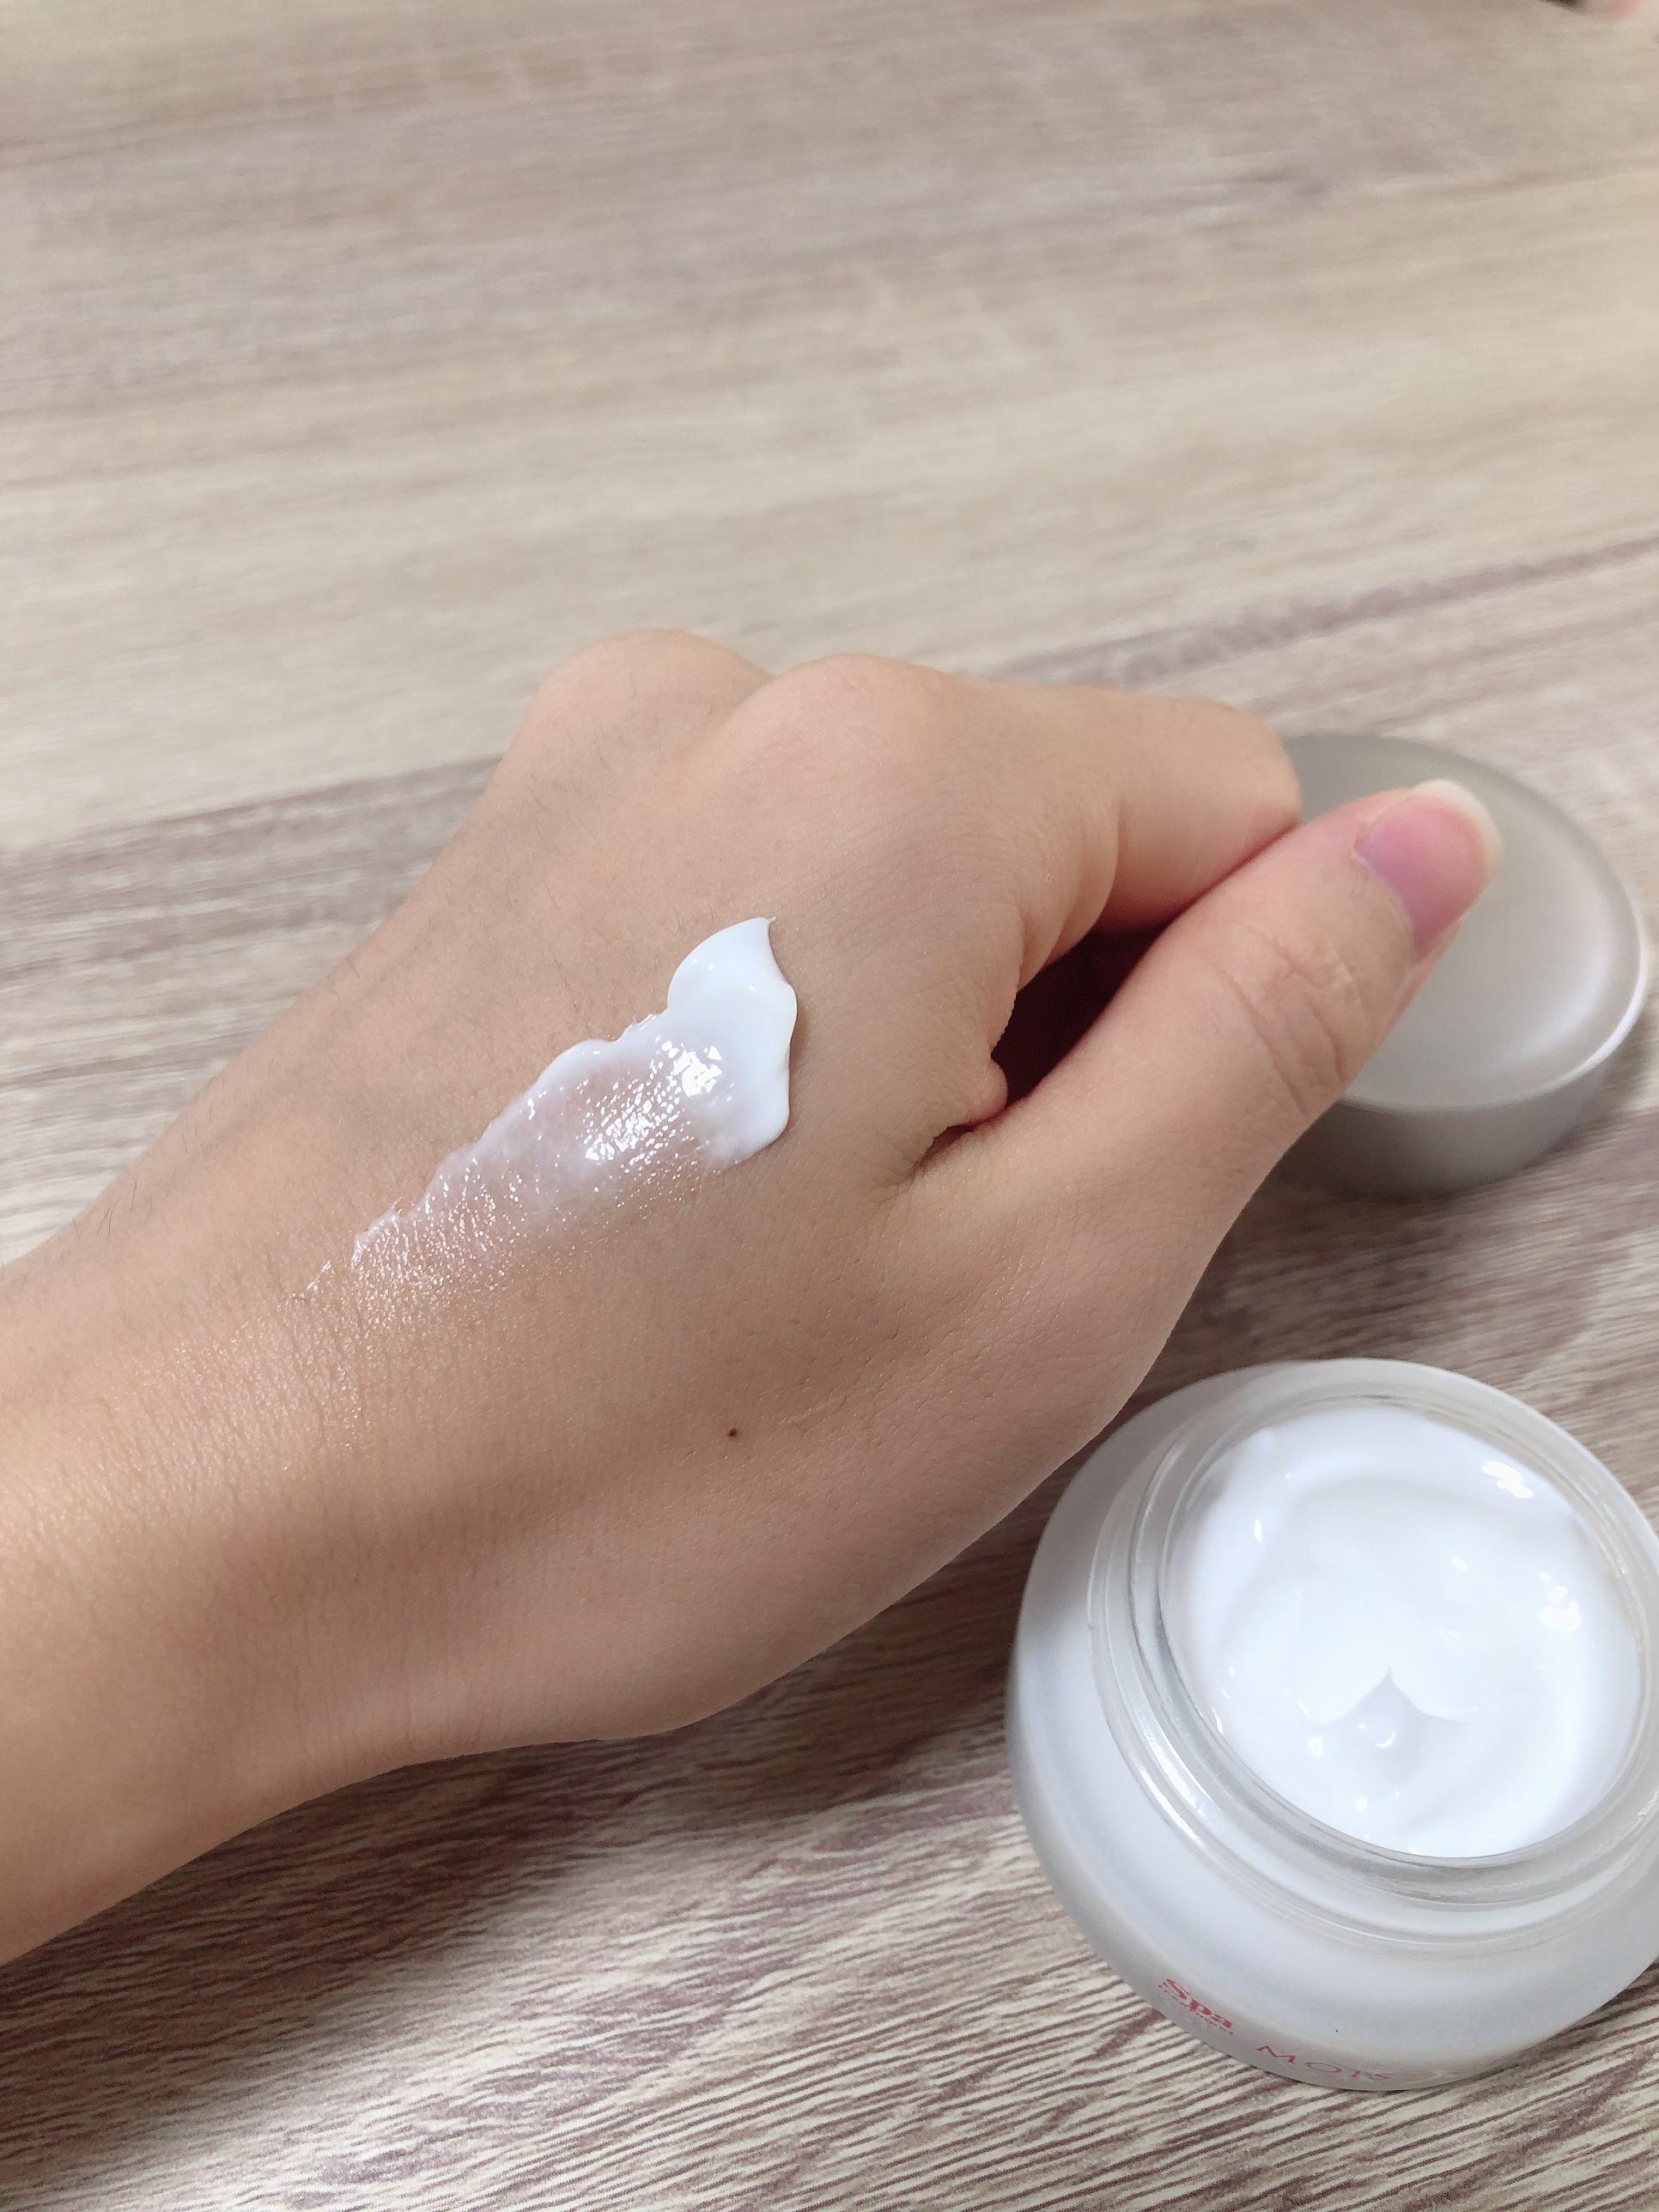 absowater Series-Moist Cream, 30g - SPA Treatment